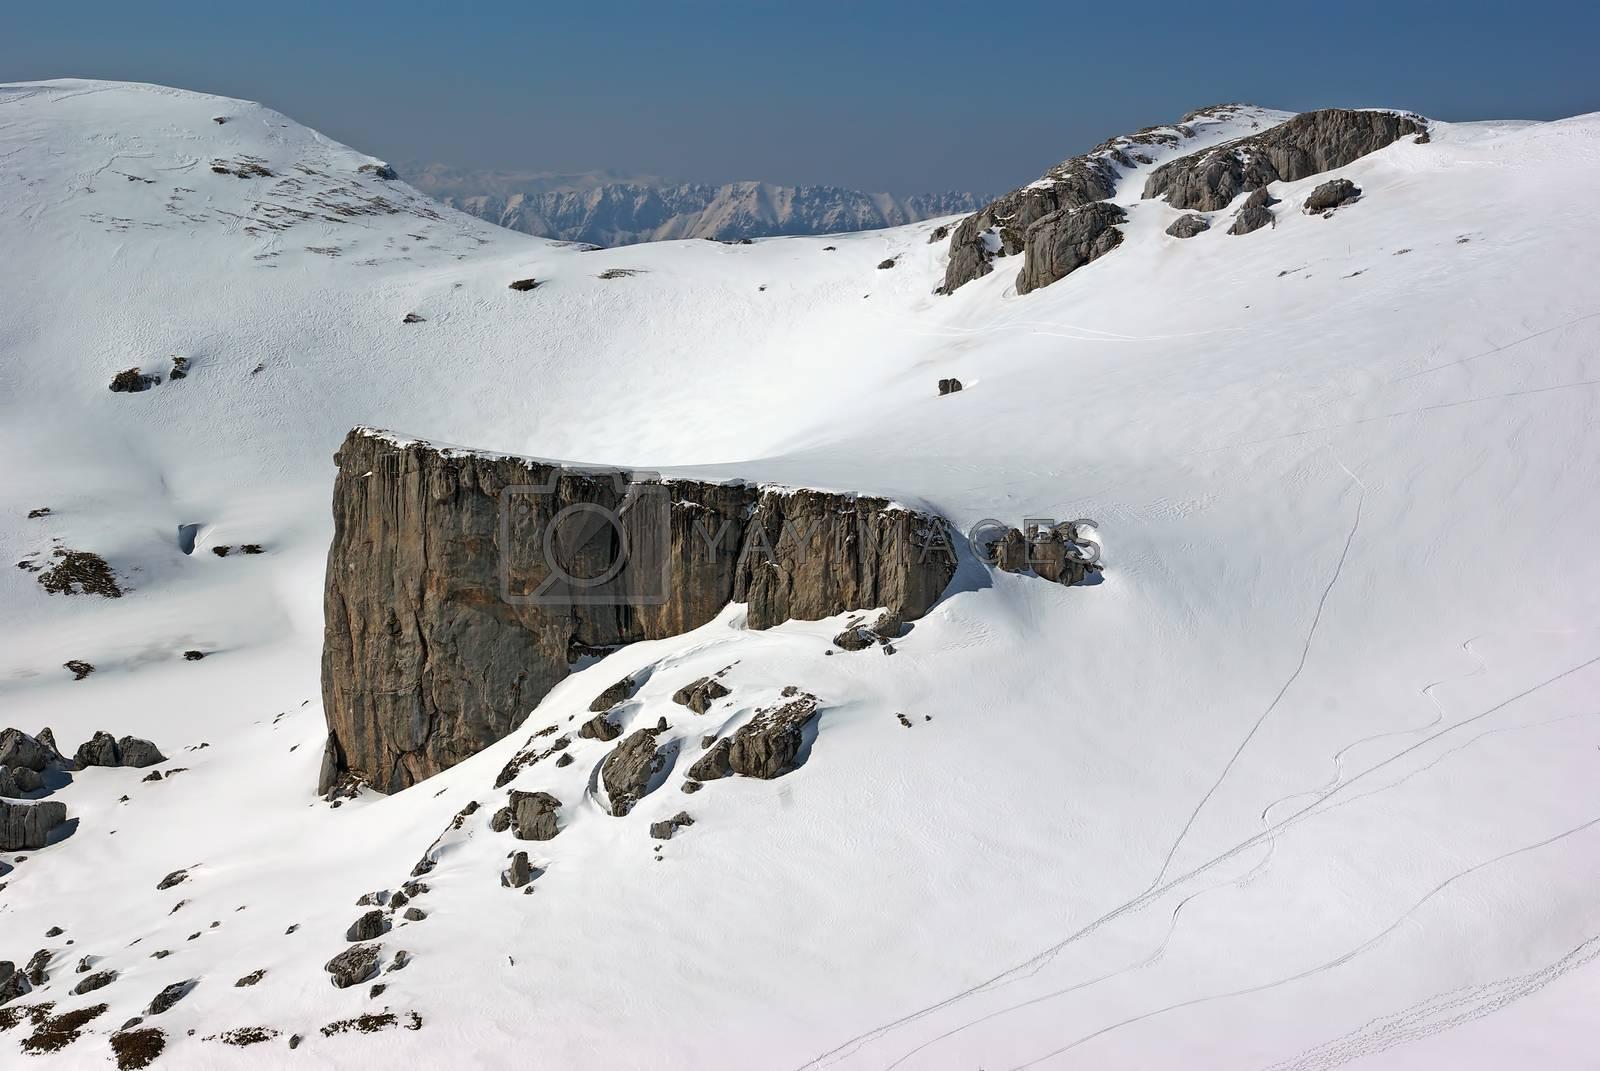 Winter mountain landscape, rock mountain covered by snow in alpine area, Romanian Carpathians